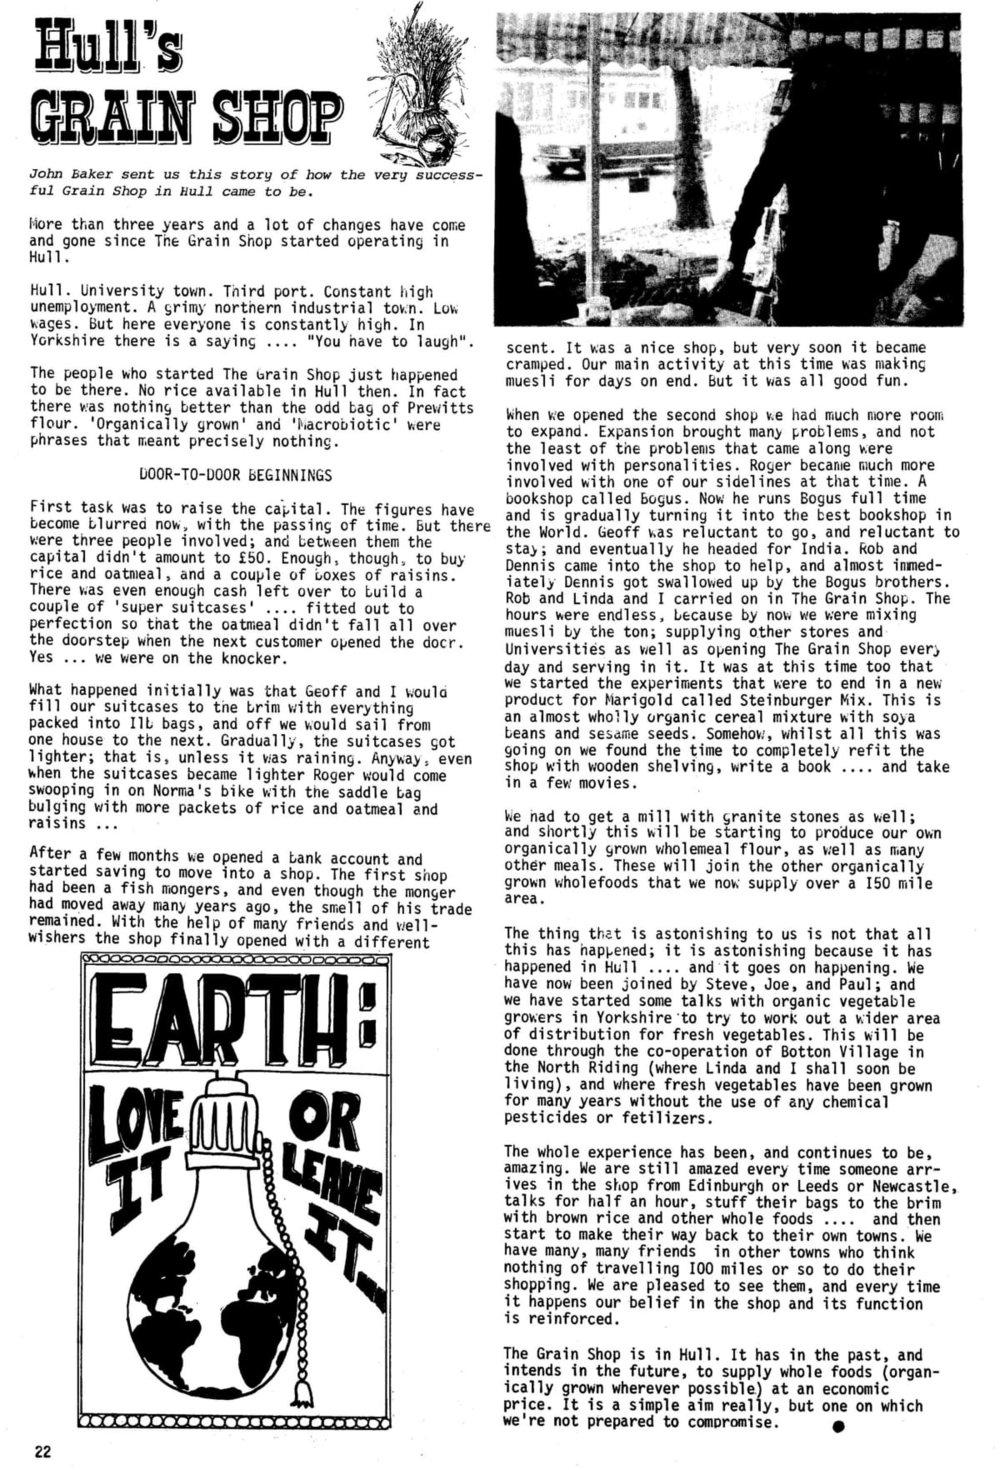 seed-v3-n1-jan1974-22.jpg